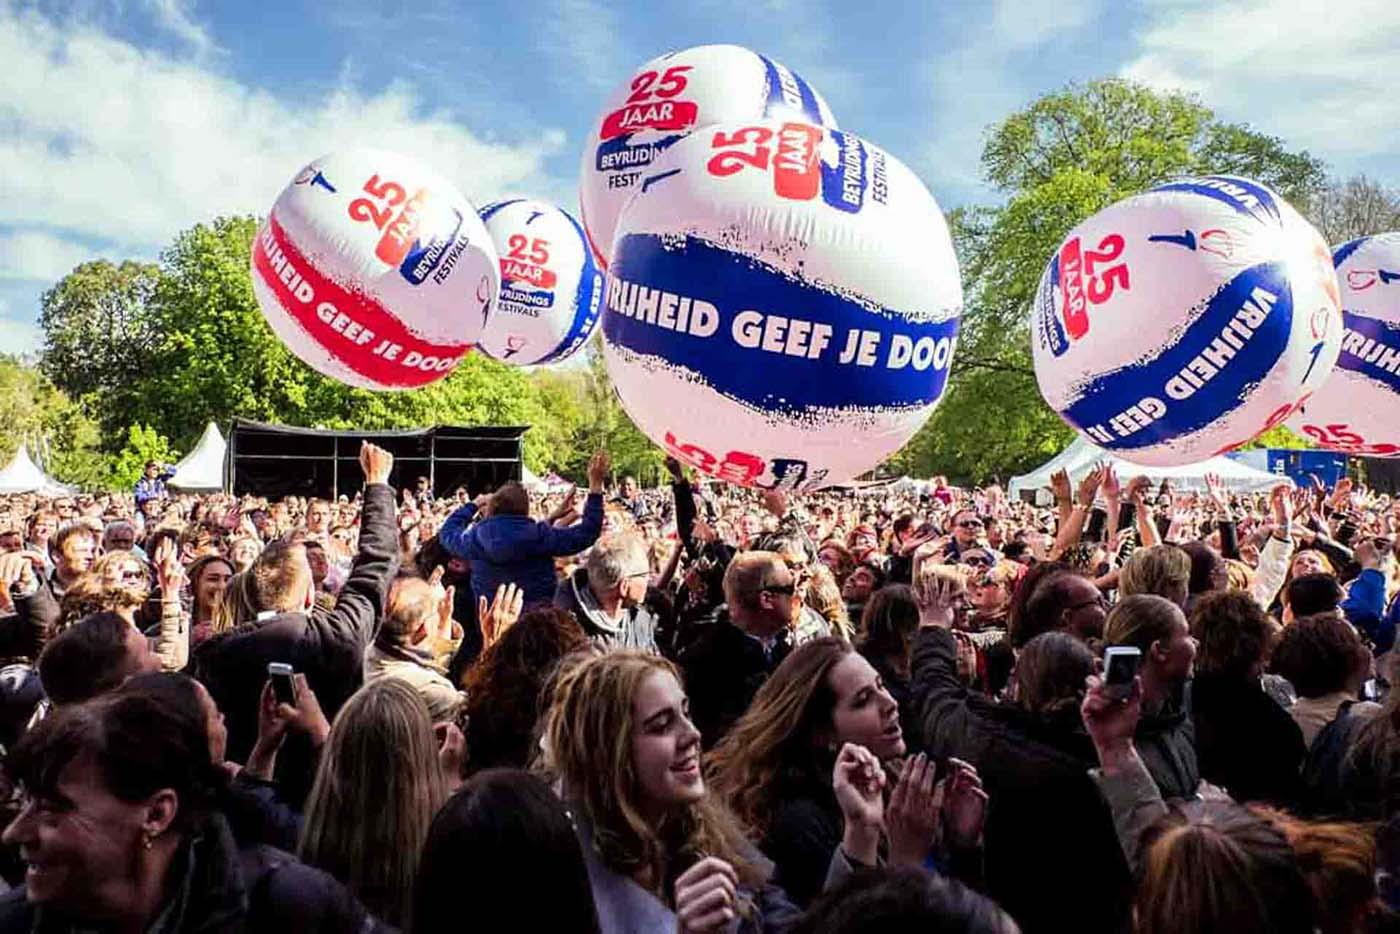 5-voor-Vijf-@Bevrijdingsfestival-Zuid-Holland-5-mei-2015, 3vr12 Rotterdam